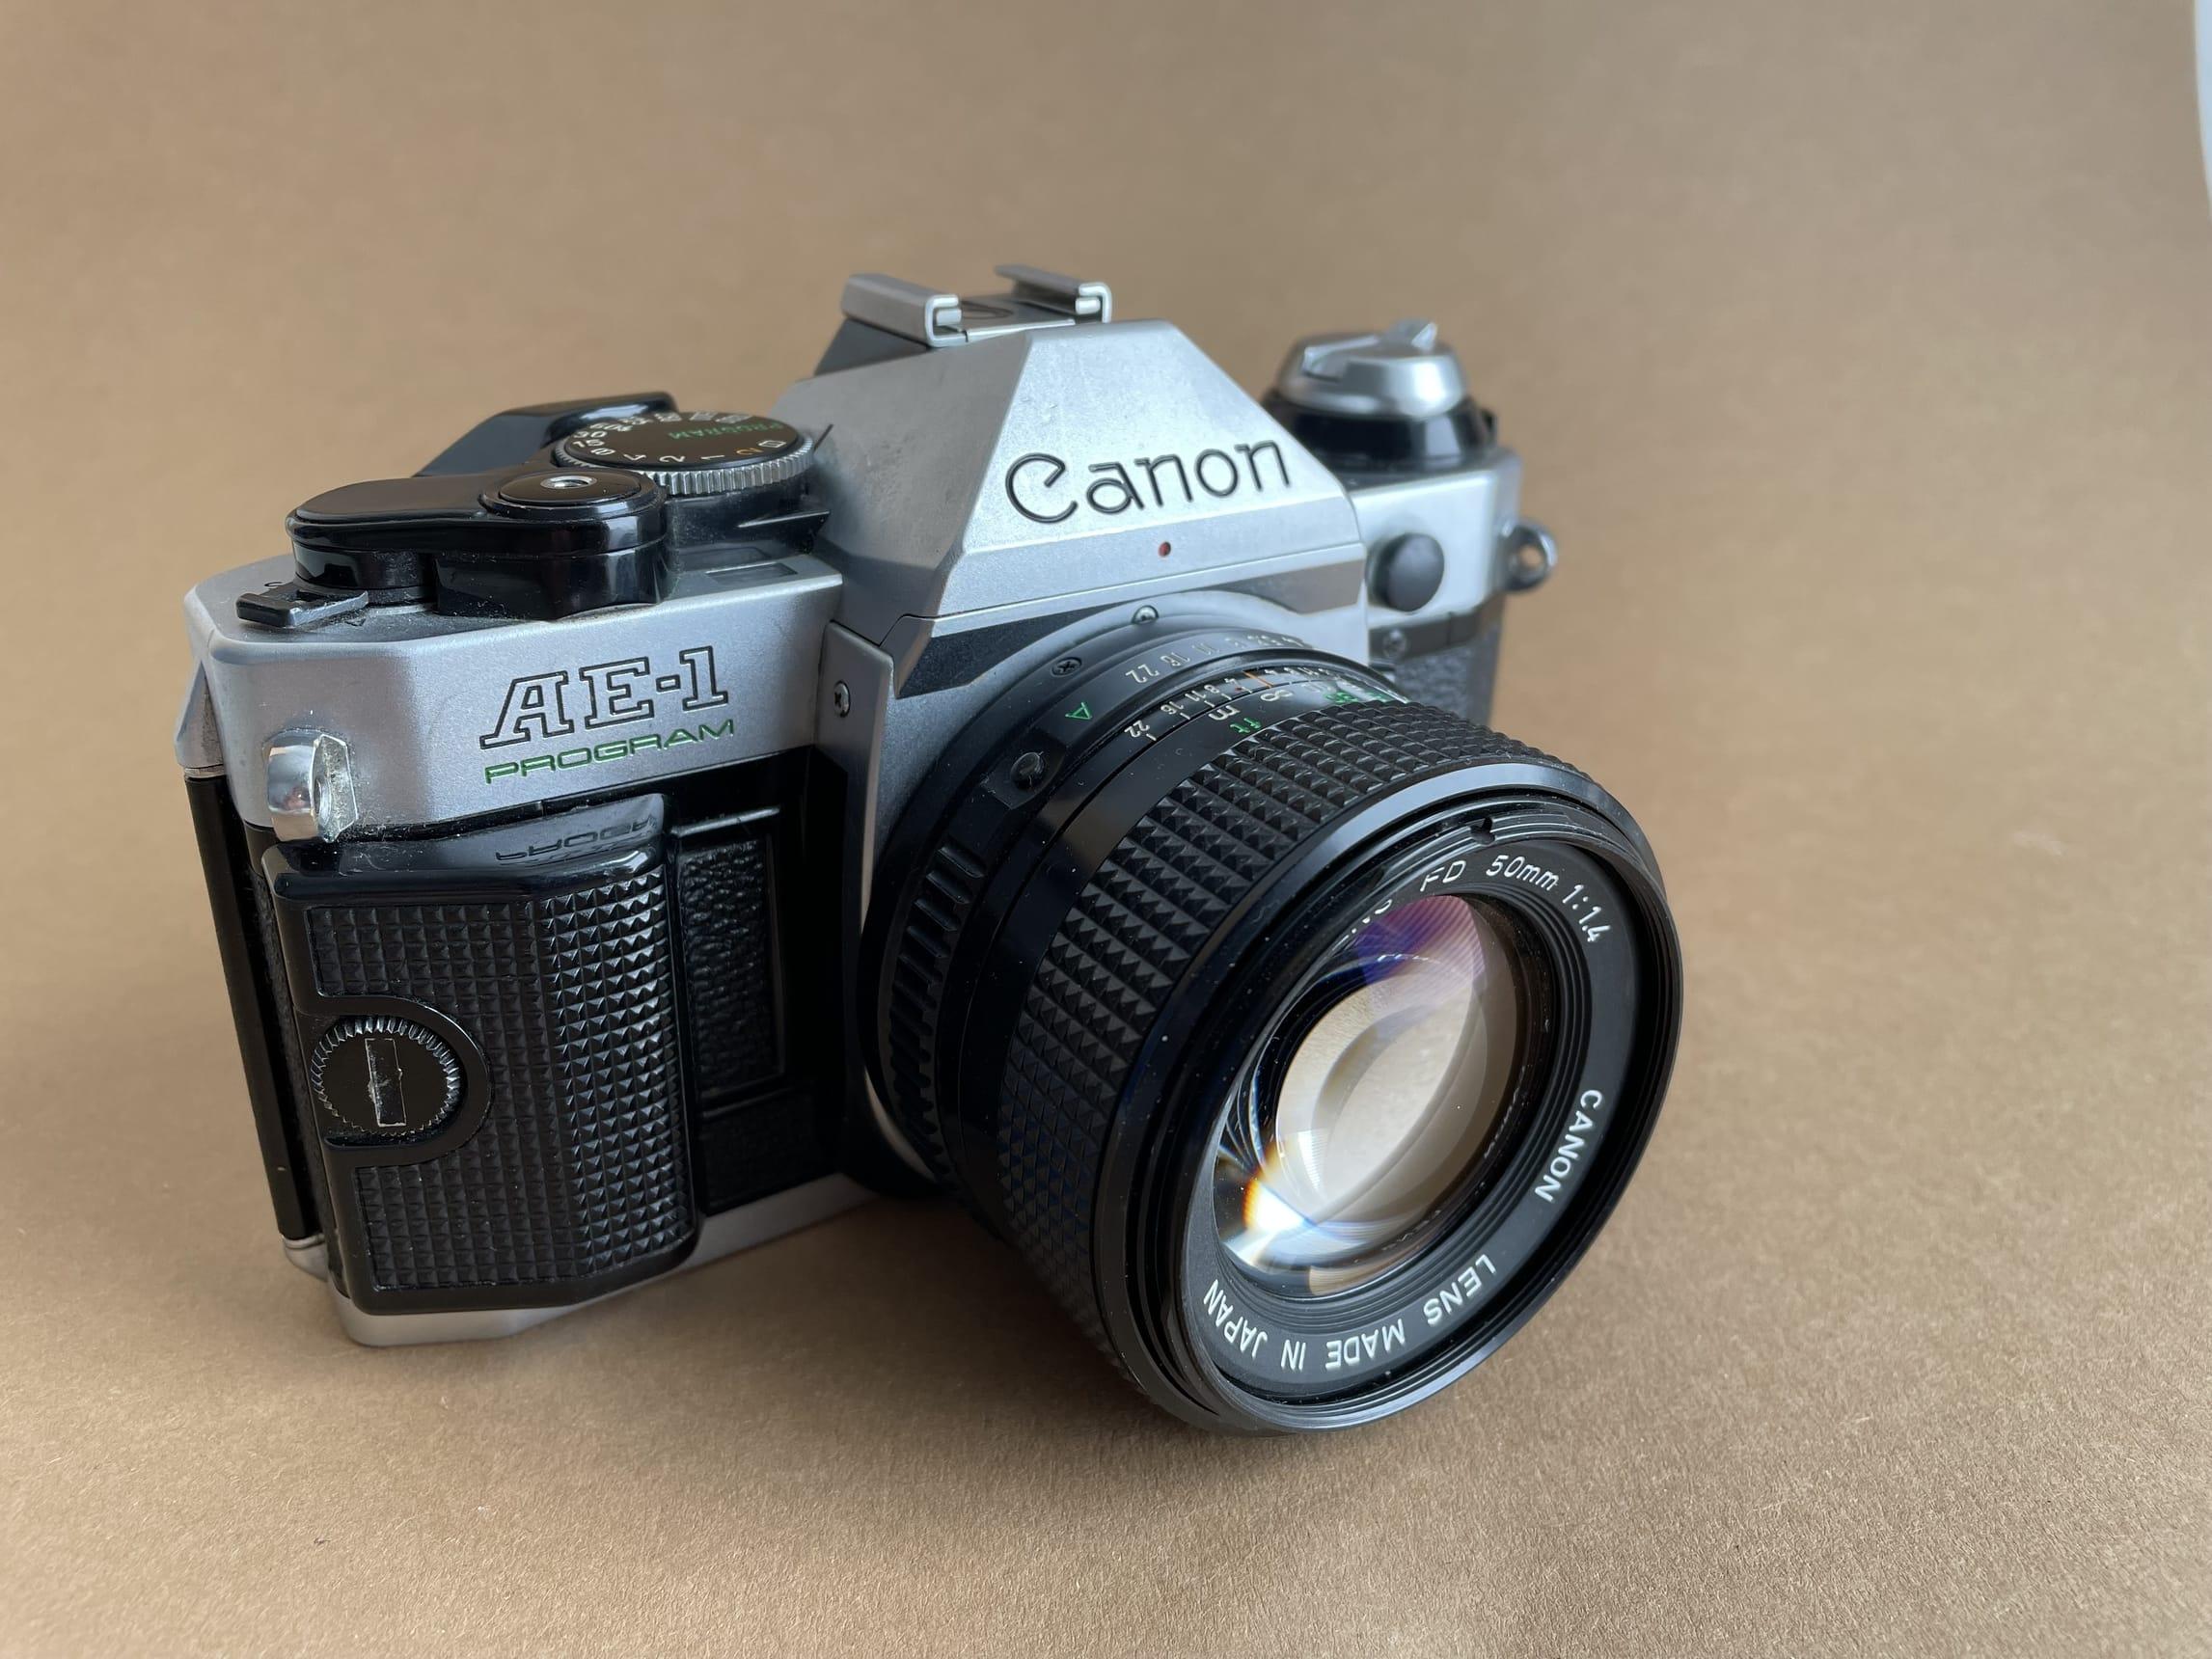 Analoge Kamera Canon AE-1 Program Frontsicht_web